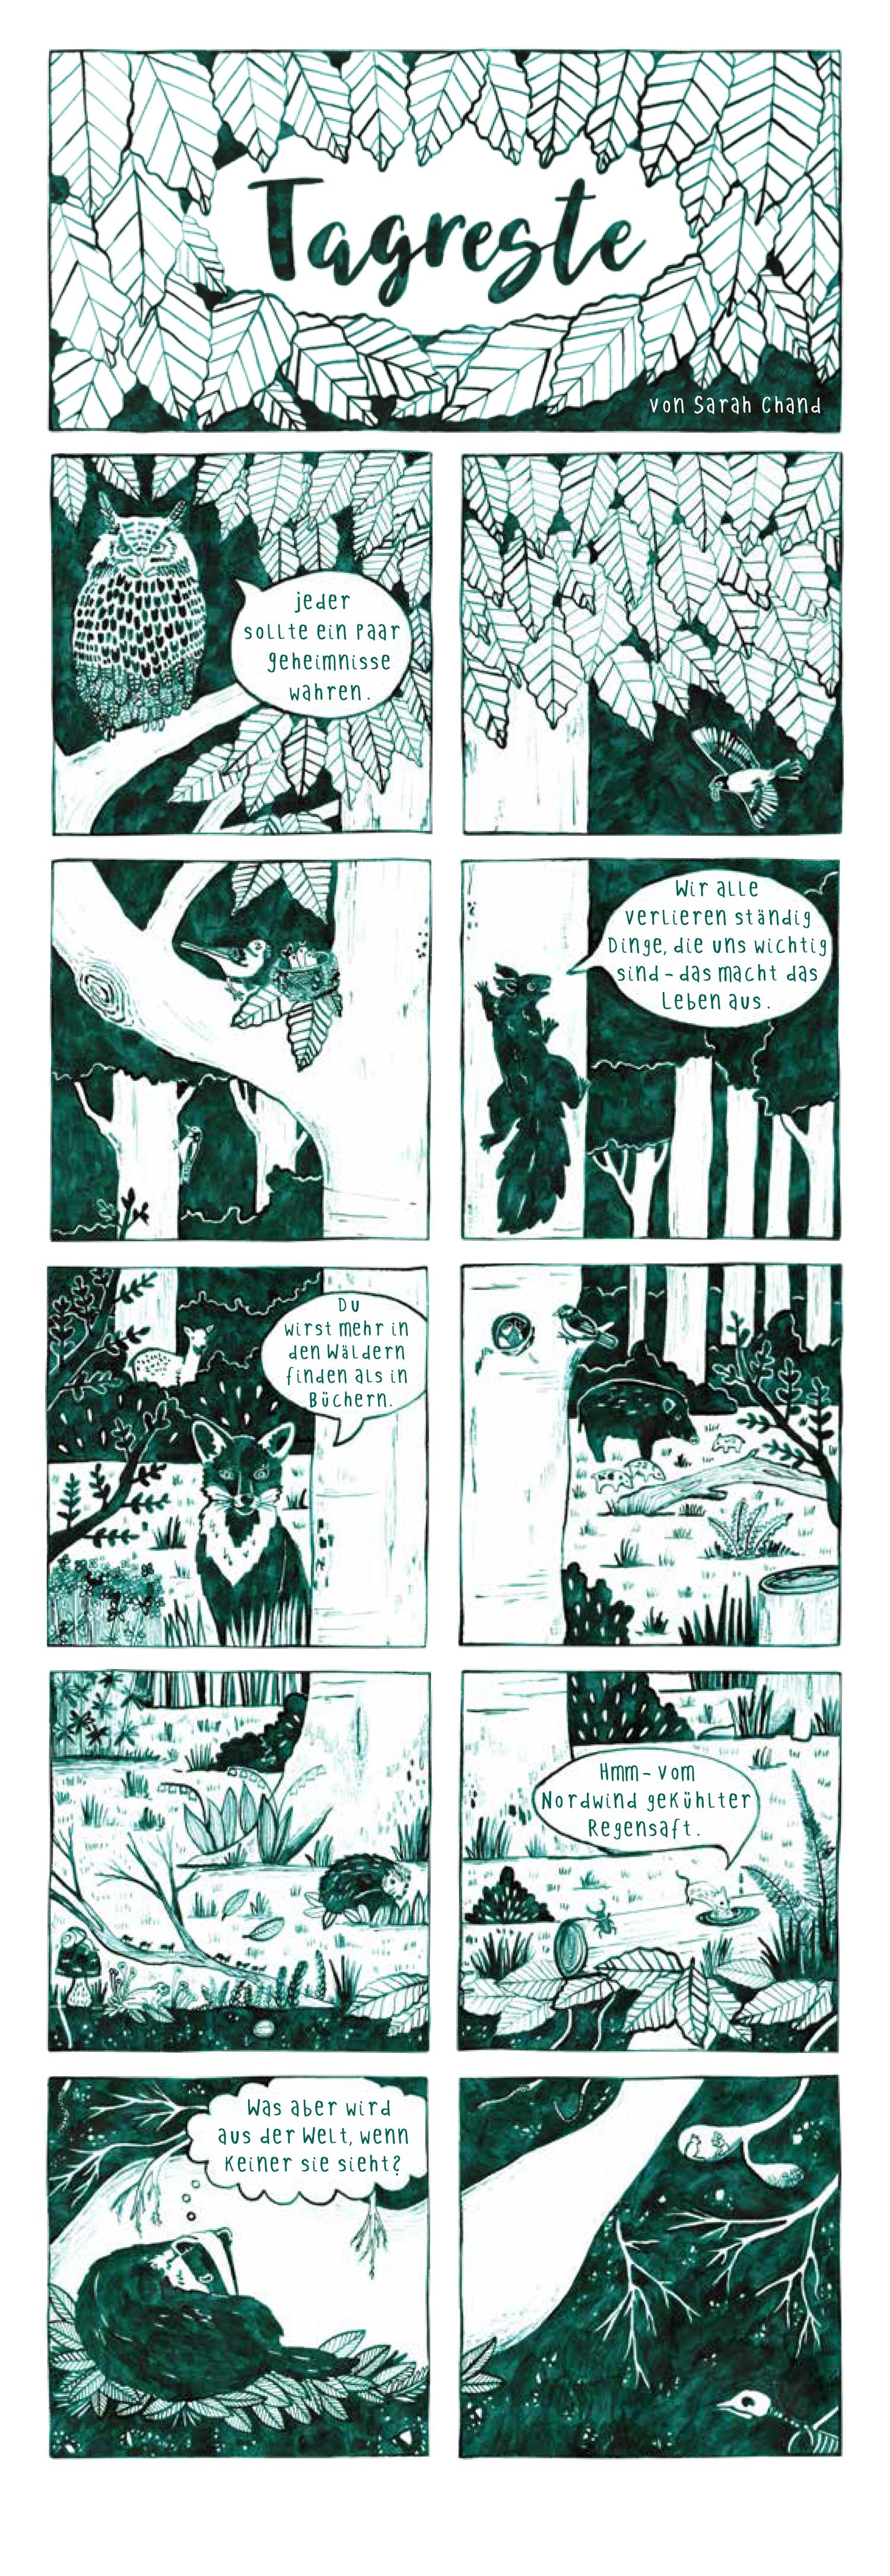 Comicstrip von Sarah Chand fuer das Comicmagazin Pure Fruit (Ausgabe 15)